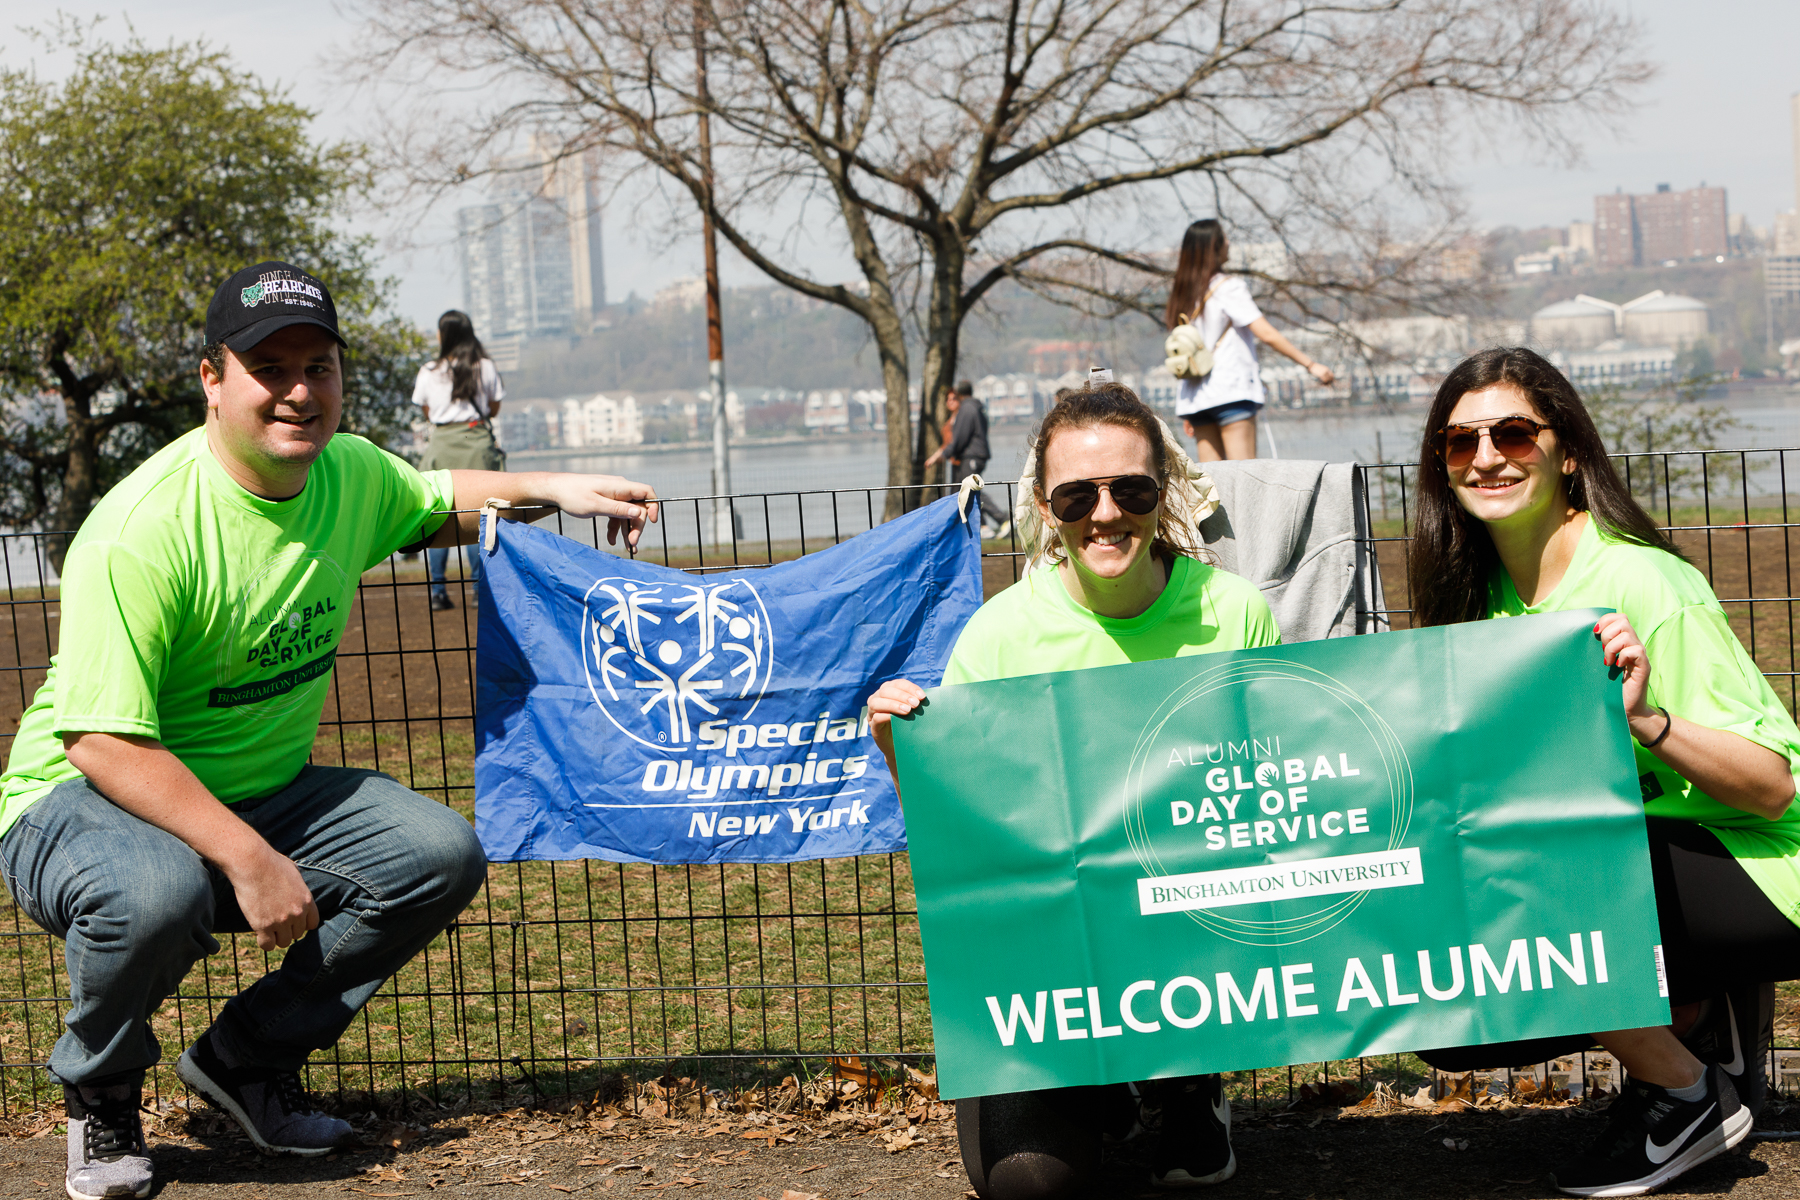 Alumni Global Day of Service - Binghamton University 2019 _ Jonathan Heisler _ 4132019 _018.jpg